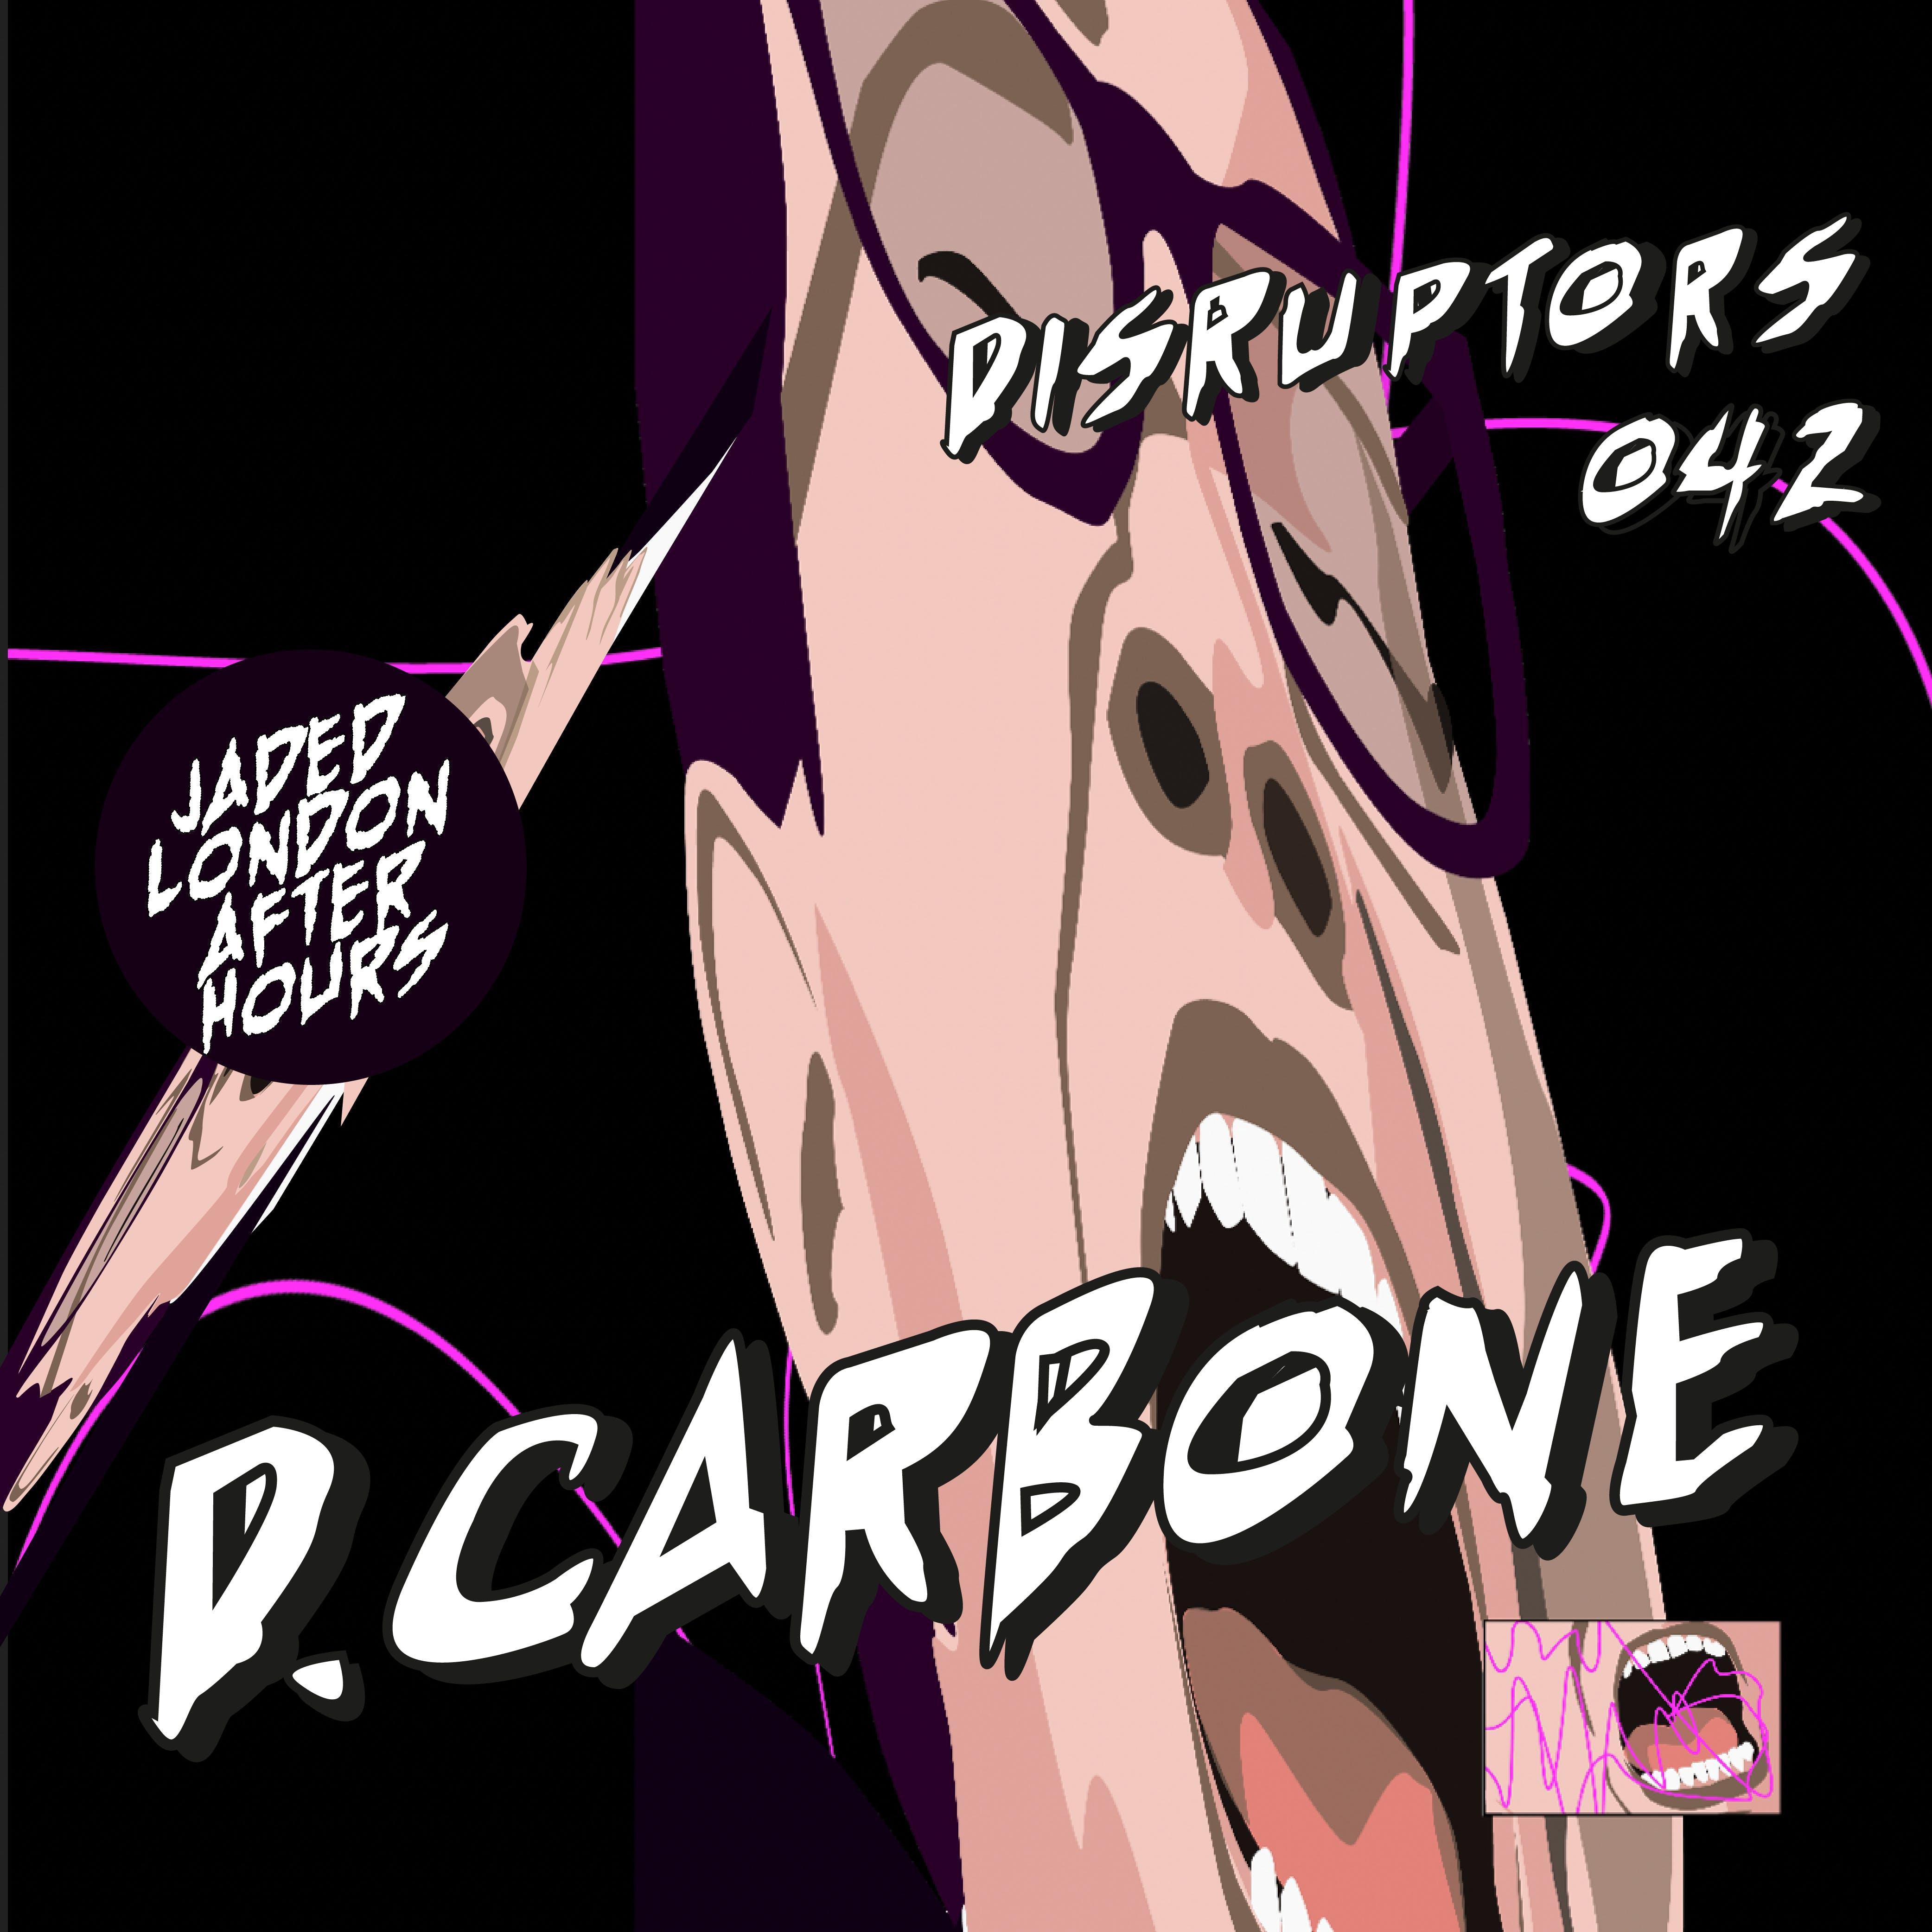 Disruptor 042 is D.Carbone